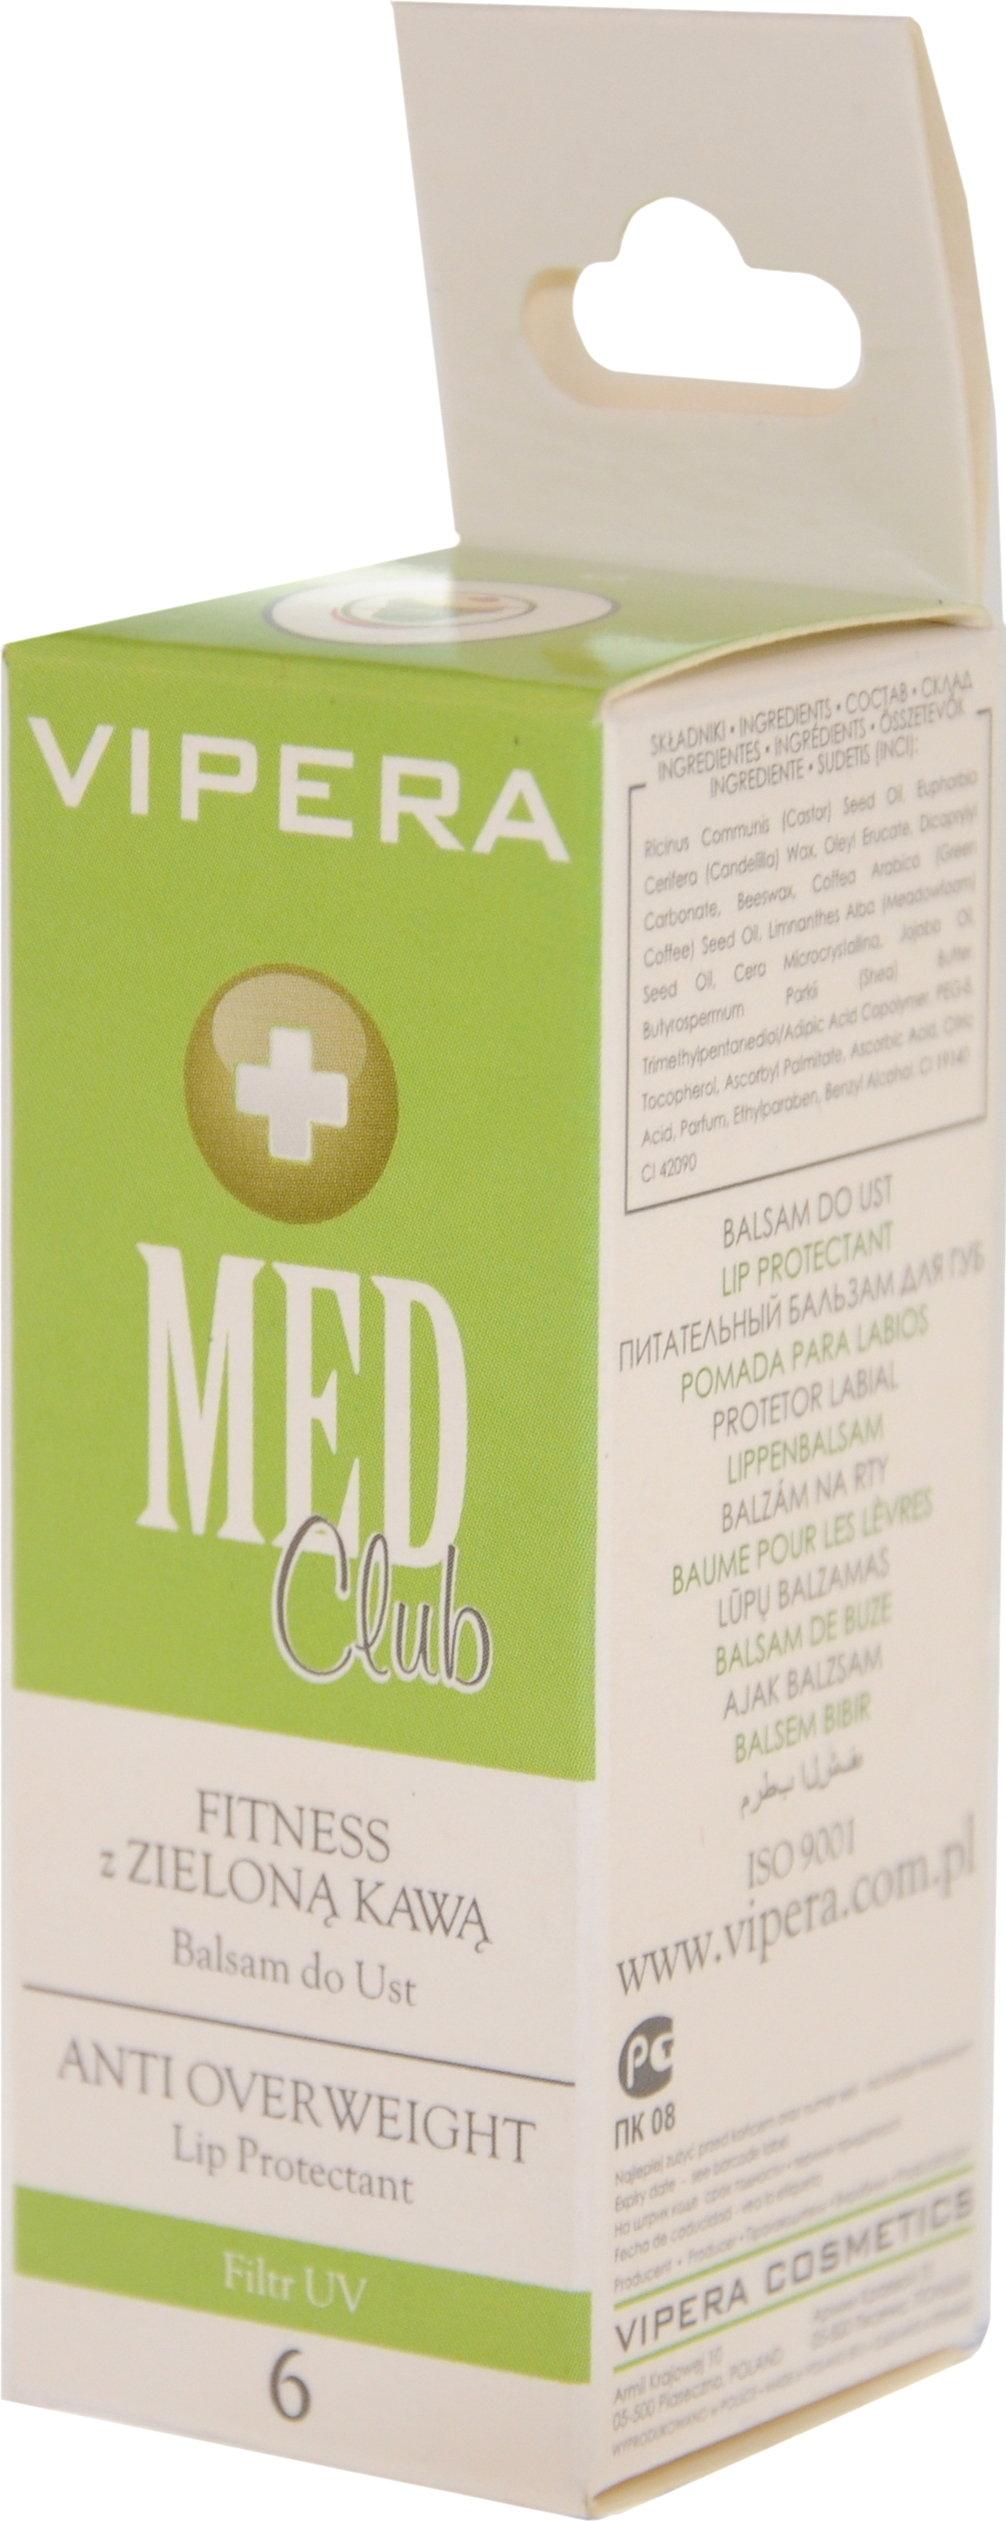 Vipera Med Club balsam do ust FITNESS Z ZIELONĄ KAWĄ 6